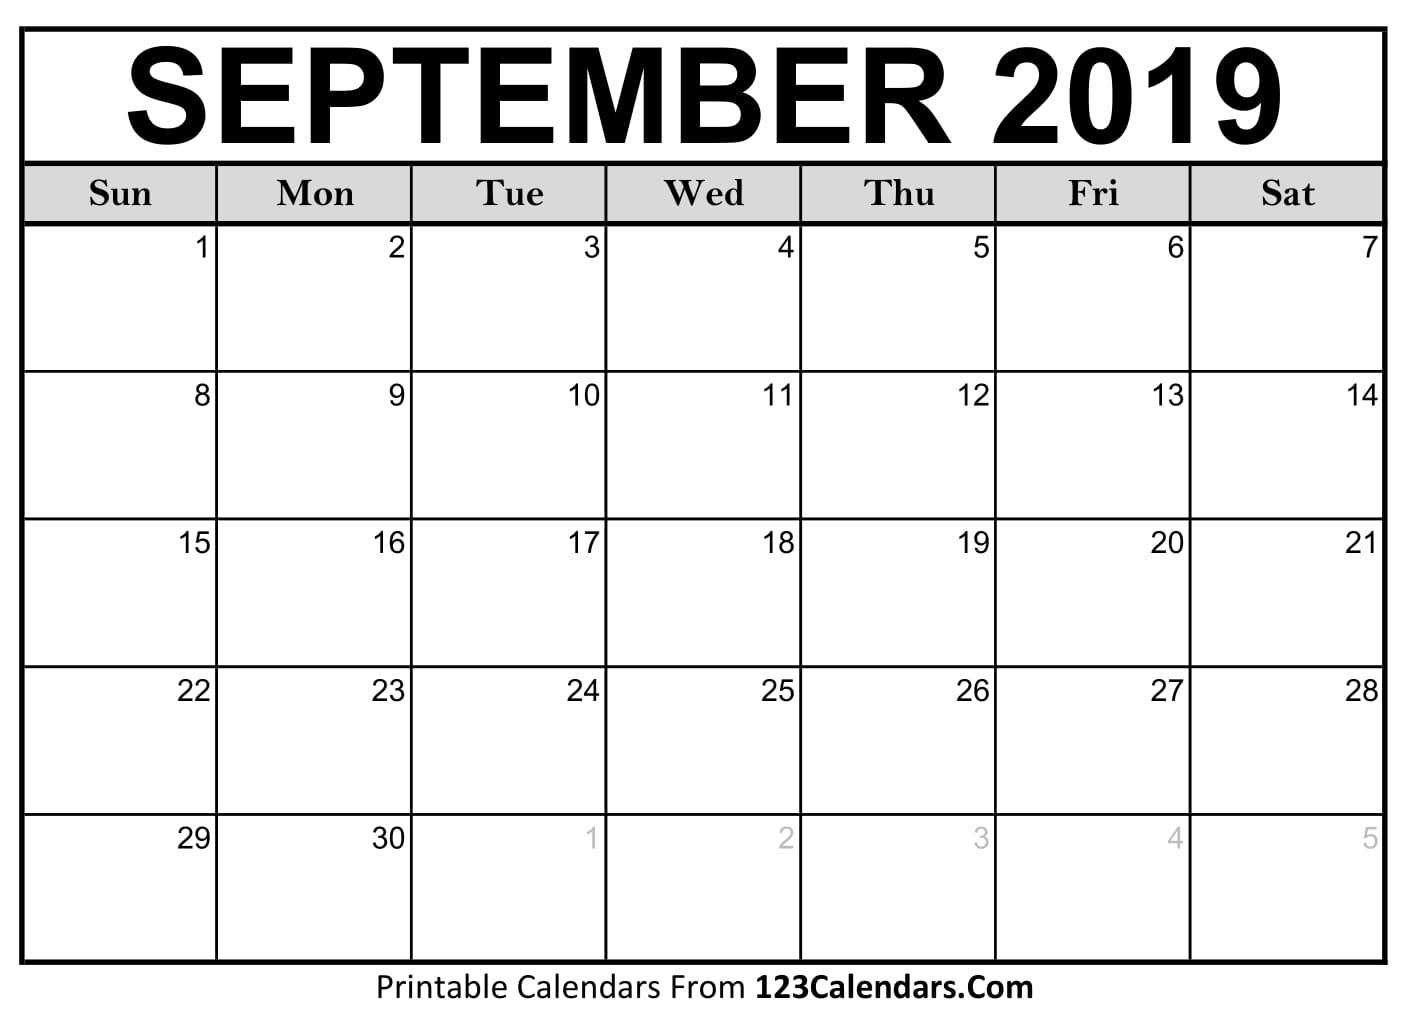 printable calendar sept 2019